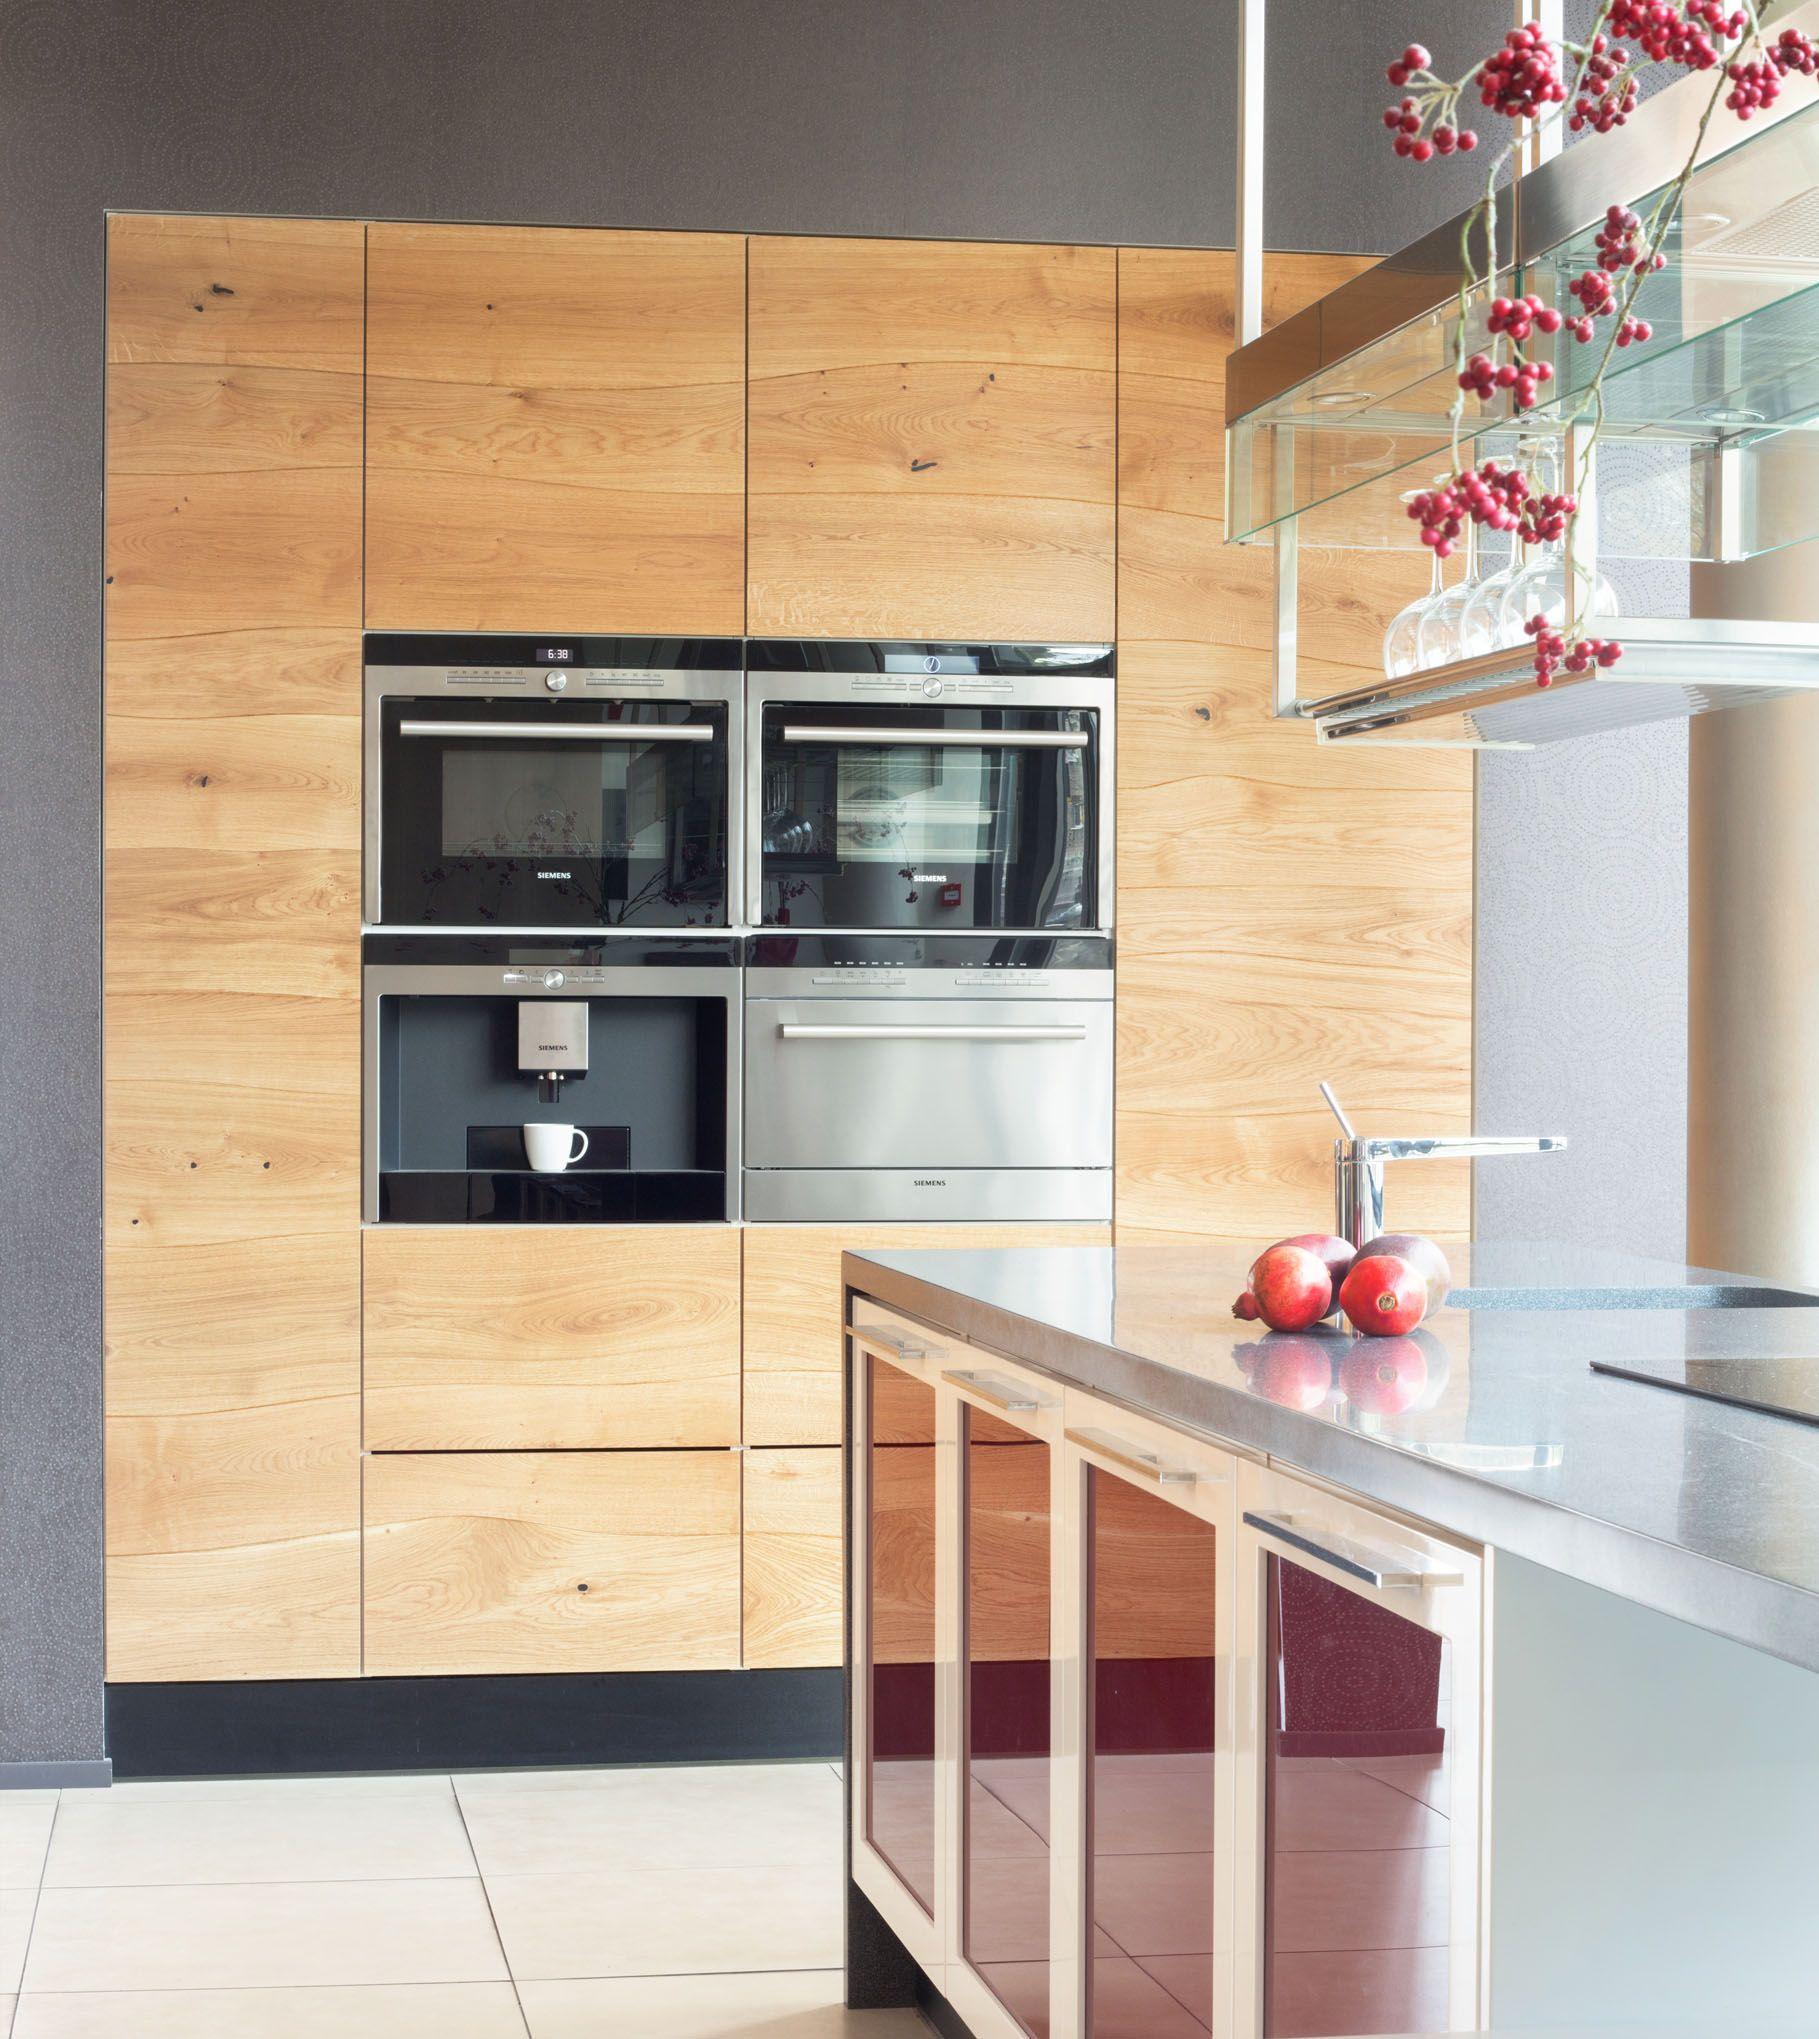 Curved Bolefloor Wooden Floorboards In Kitchen Interior Wooden Kitchen Modern Wooden Kitchen Kitchen Interior